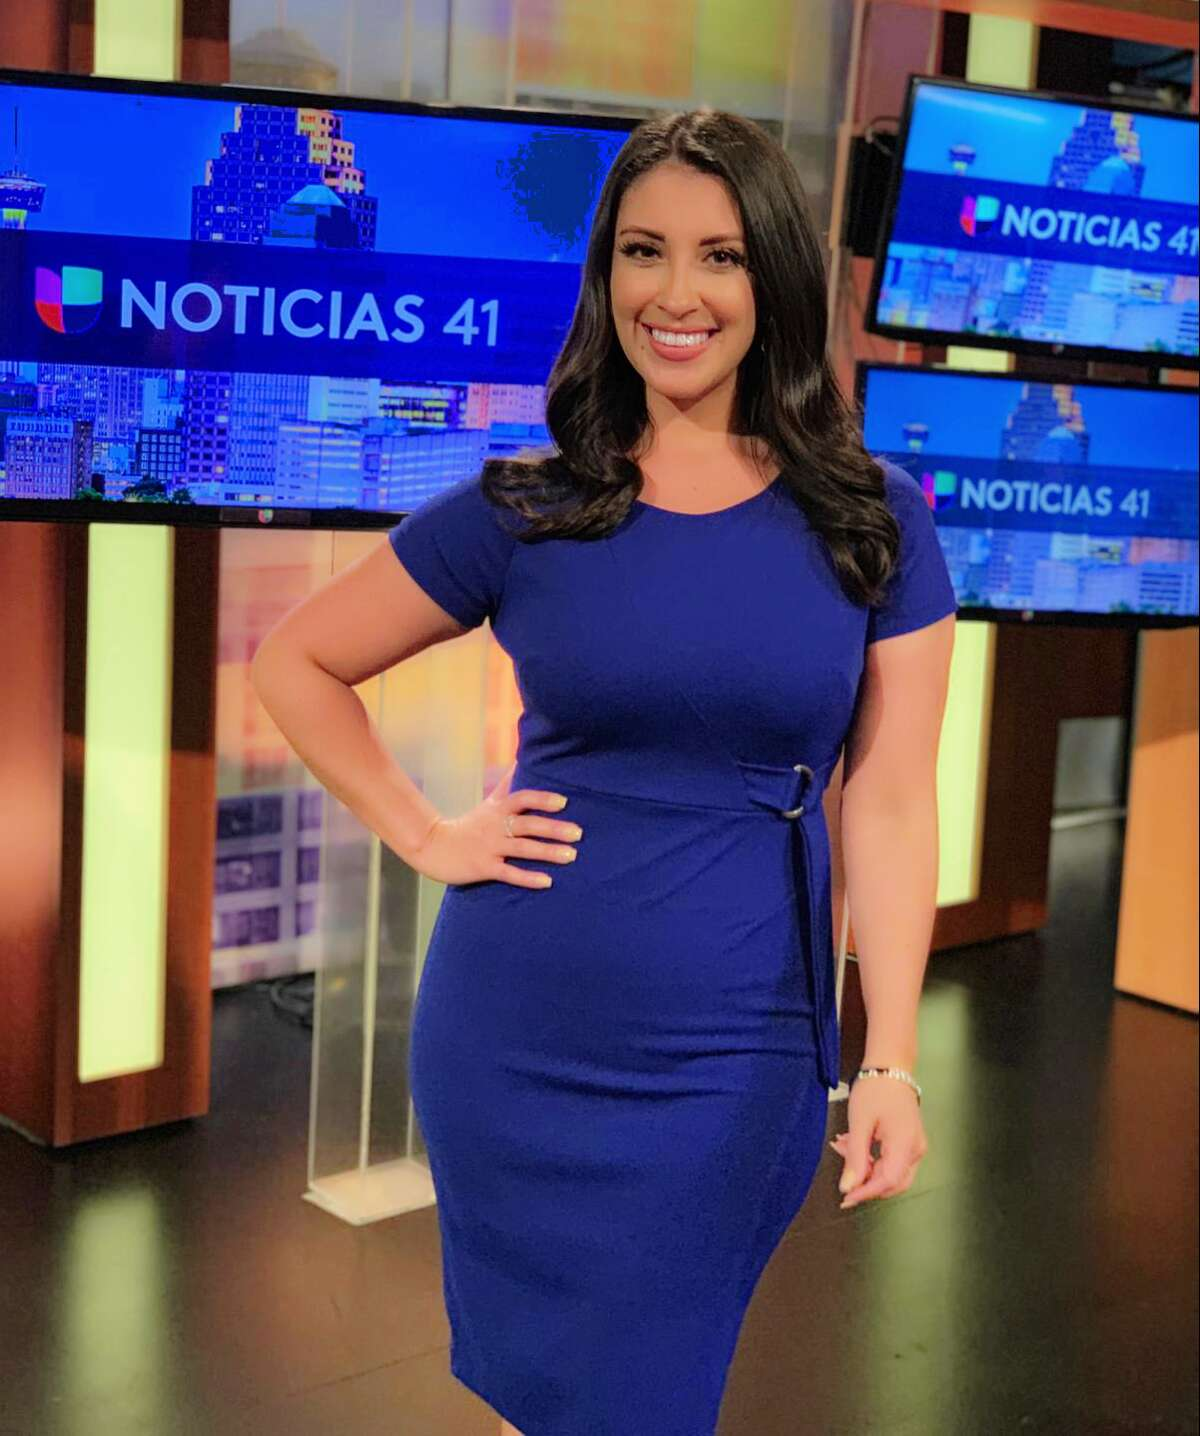 Univision San Antonio welcomes Valeria Barriga as their new weather anchor for 'Primera Hora.'